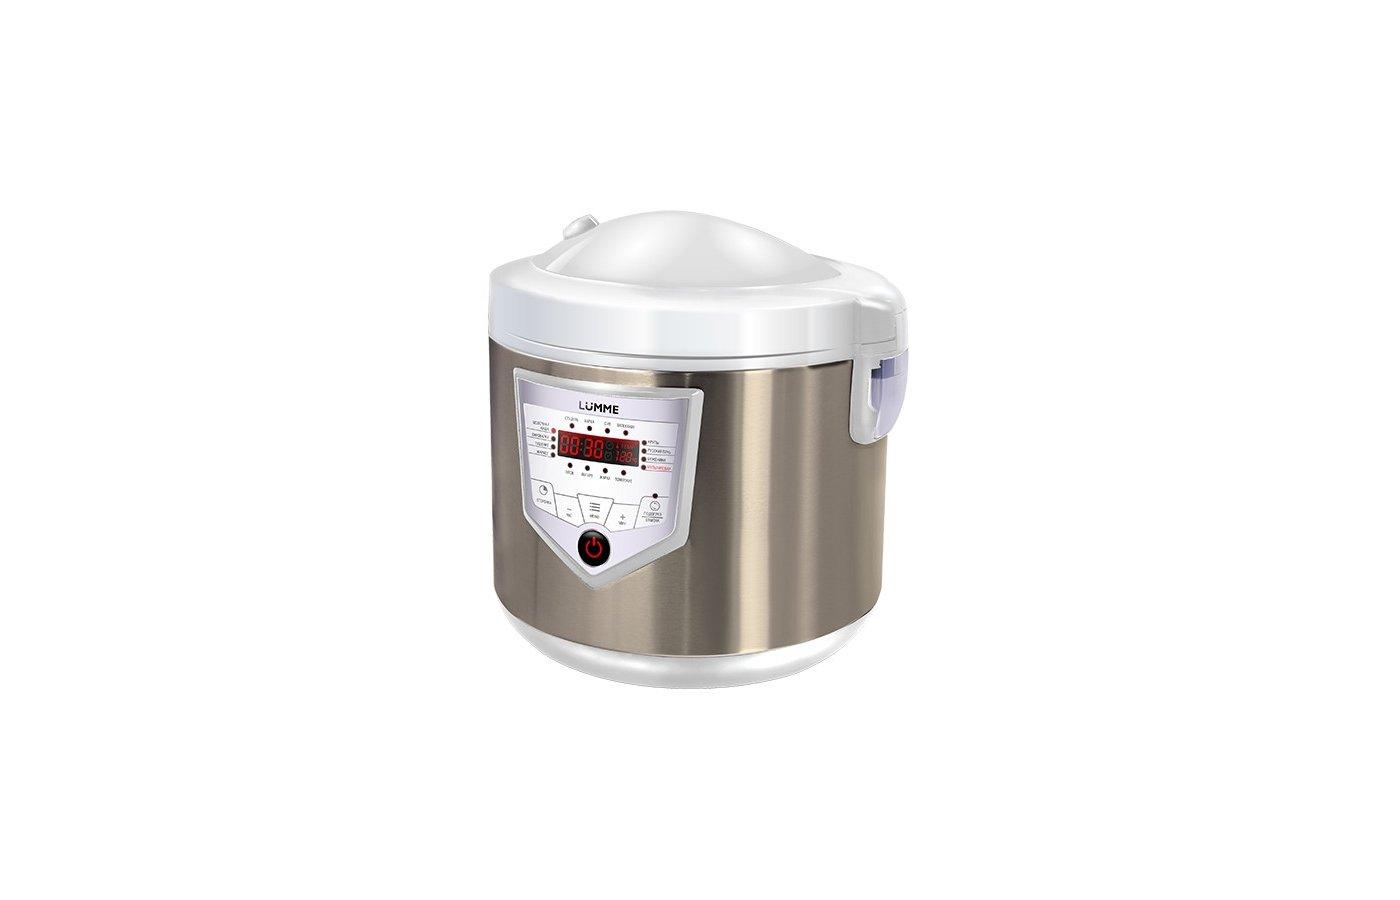 Мультиварка LUMME LU-1446 бел/шампань